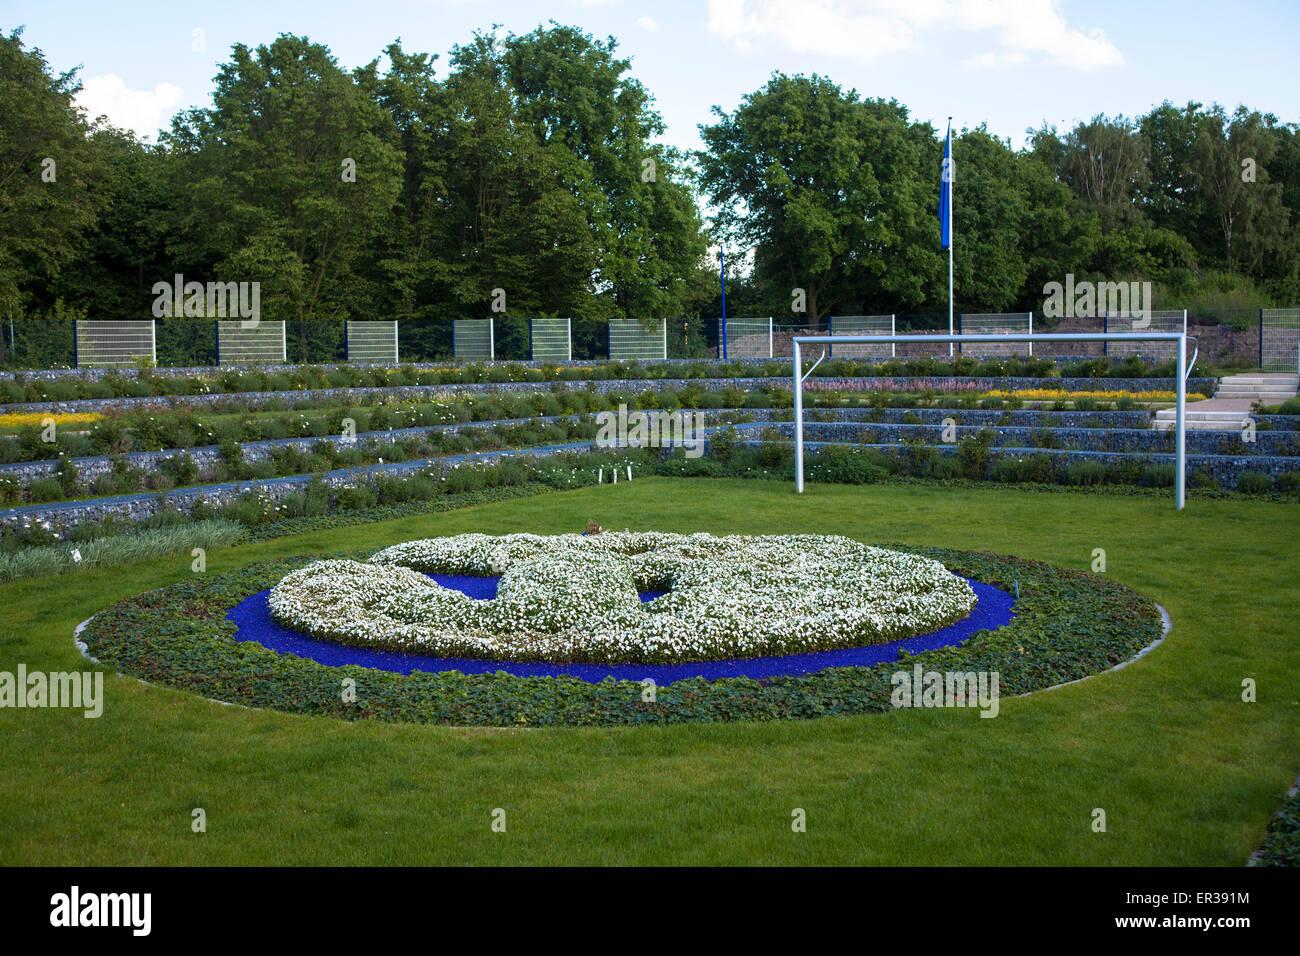 Europa, Deutschland, Nordrhein-Westfalen, Ruhrgebiet, Gelsenkirchen, Friedhof fuer Fans des Fussballclubs FC Schalke - Stock Image